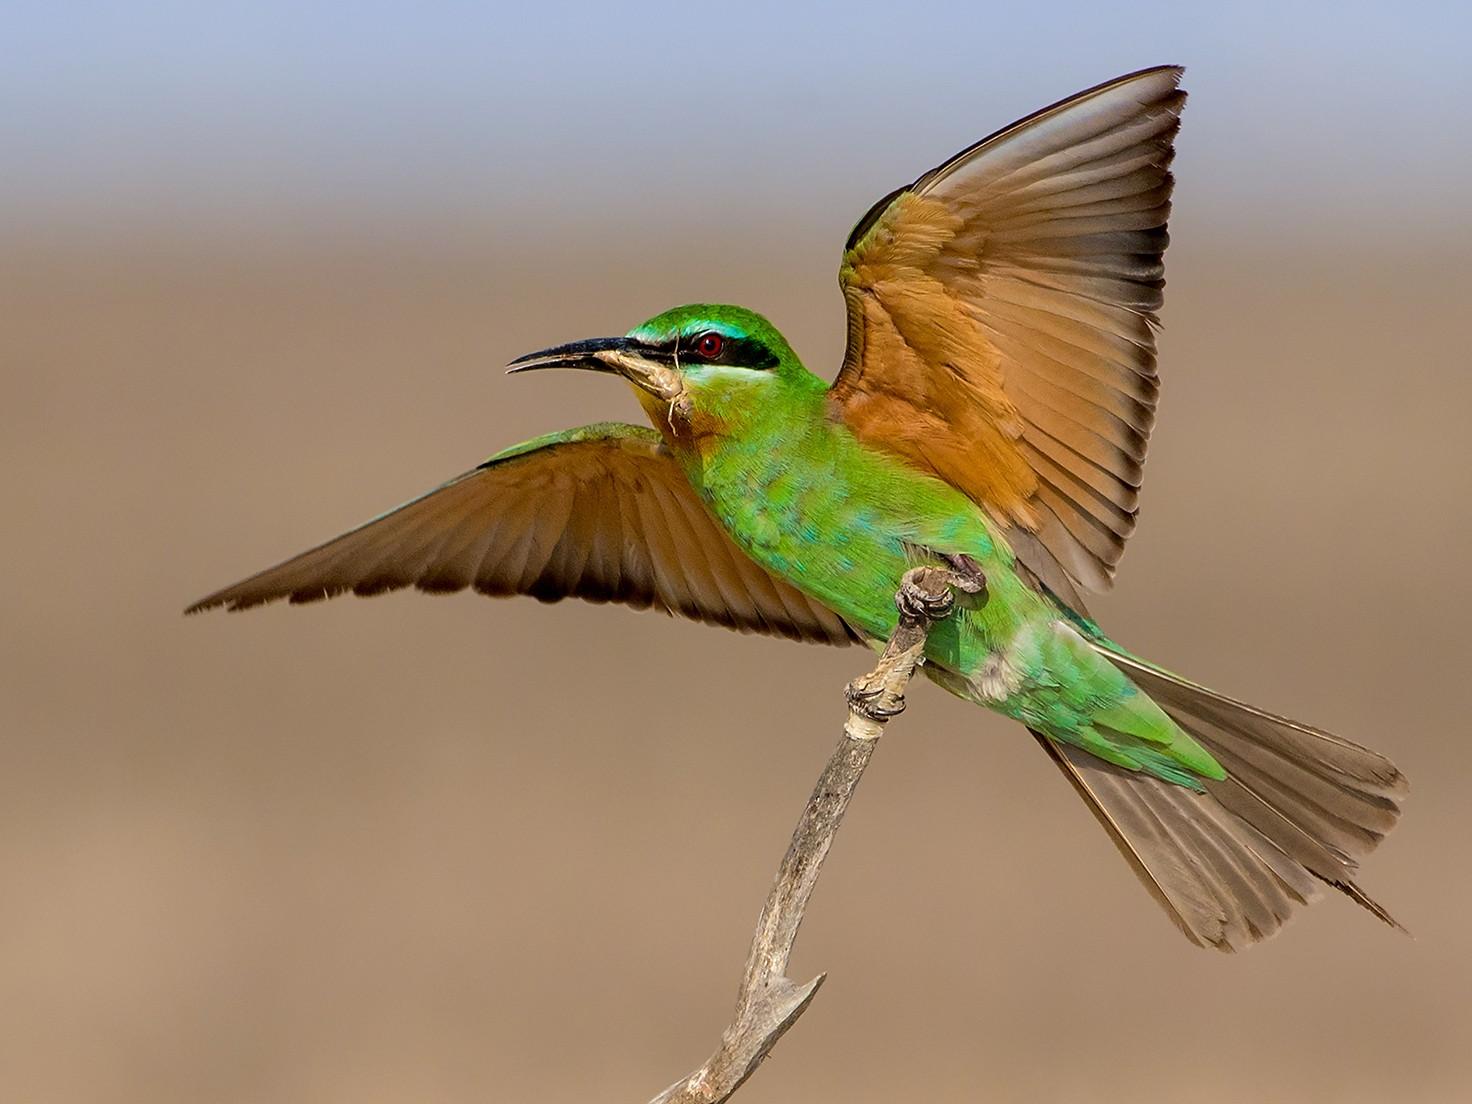 Blue-cheeked Bee-eater - Abdul Saleem